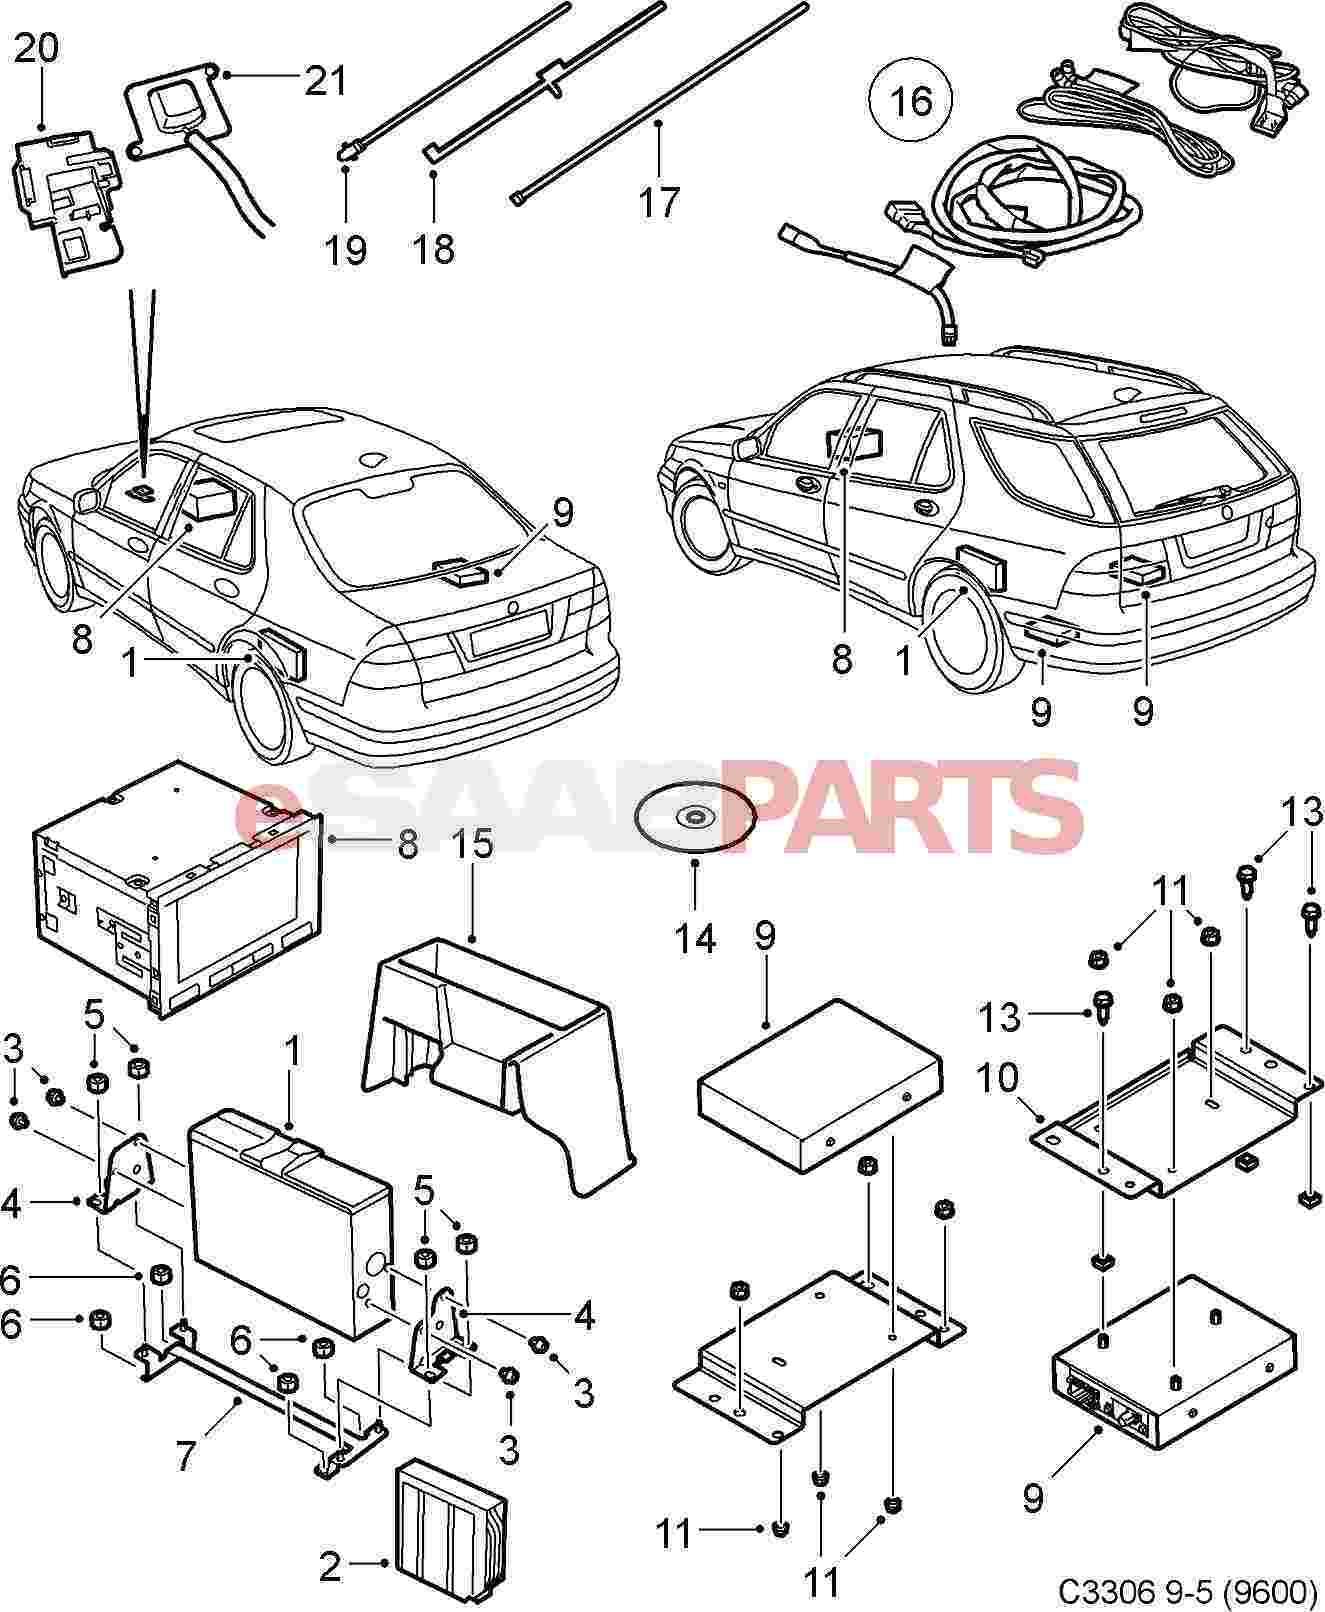 Saab 9 5 Aftermarket Parts